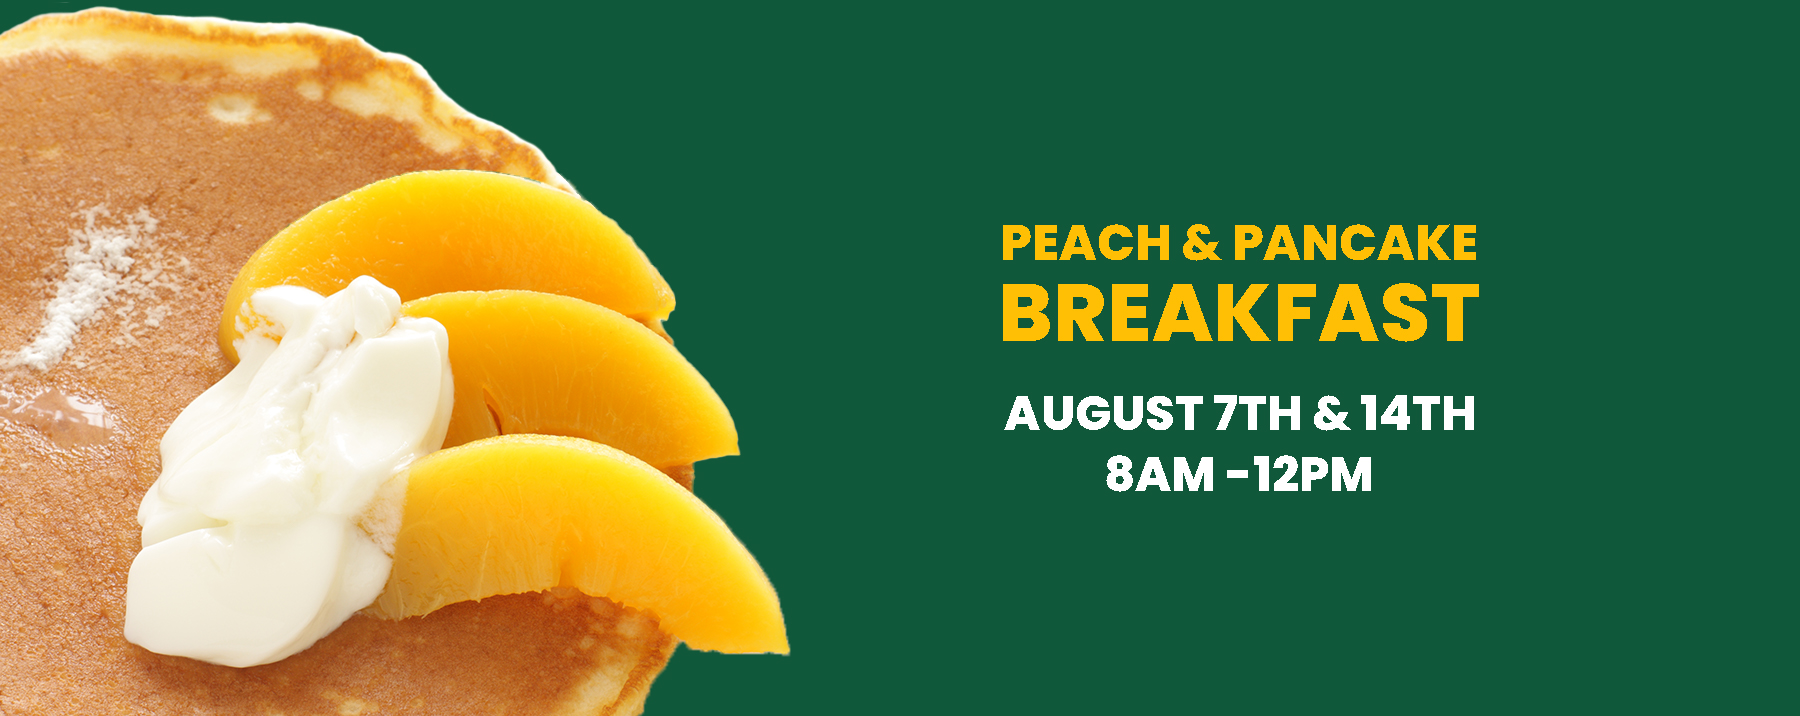 Peach and Pancake Breakfast